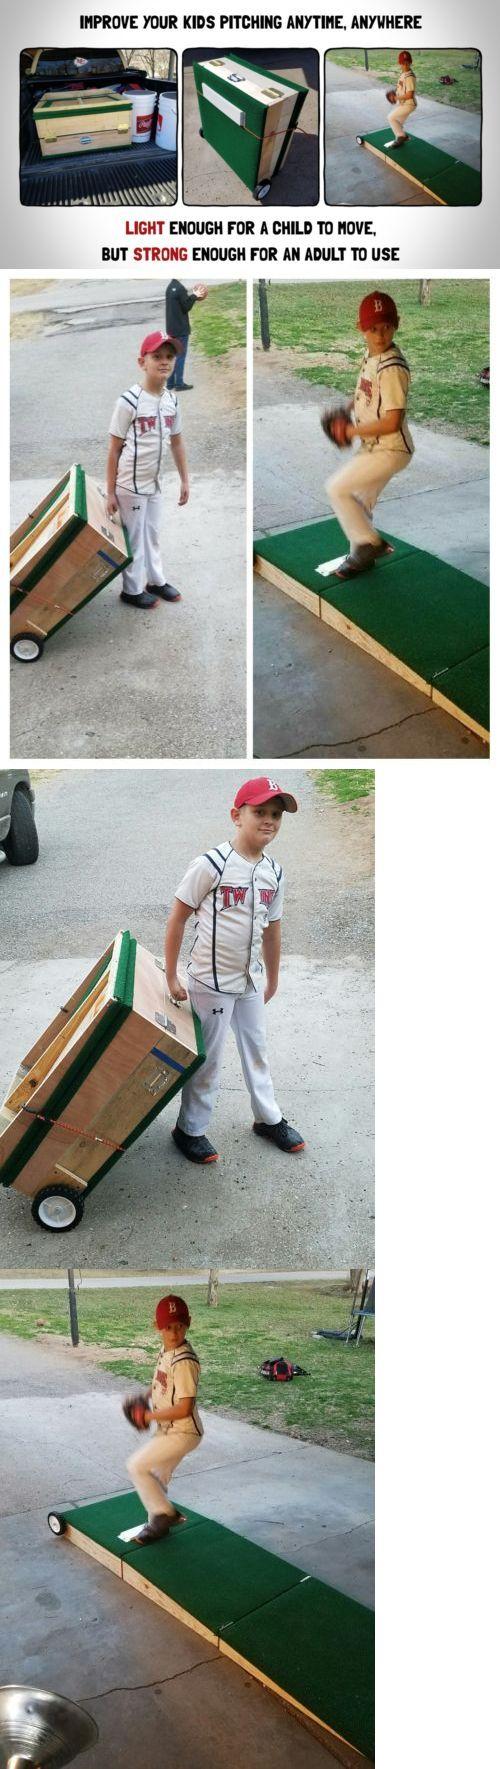 best 25 baseball pitching ideas on pinterest baseball training